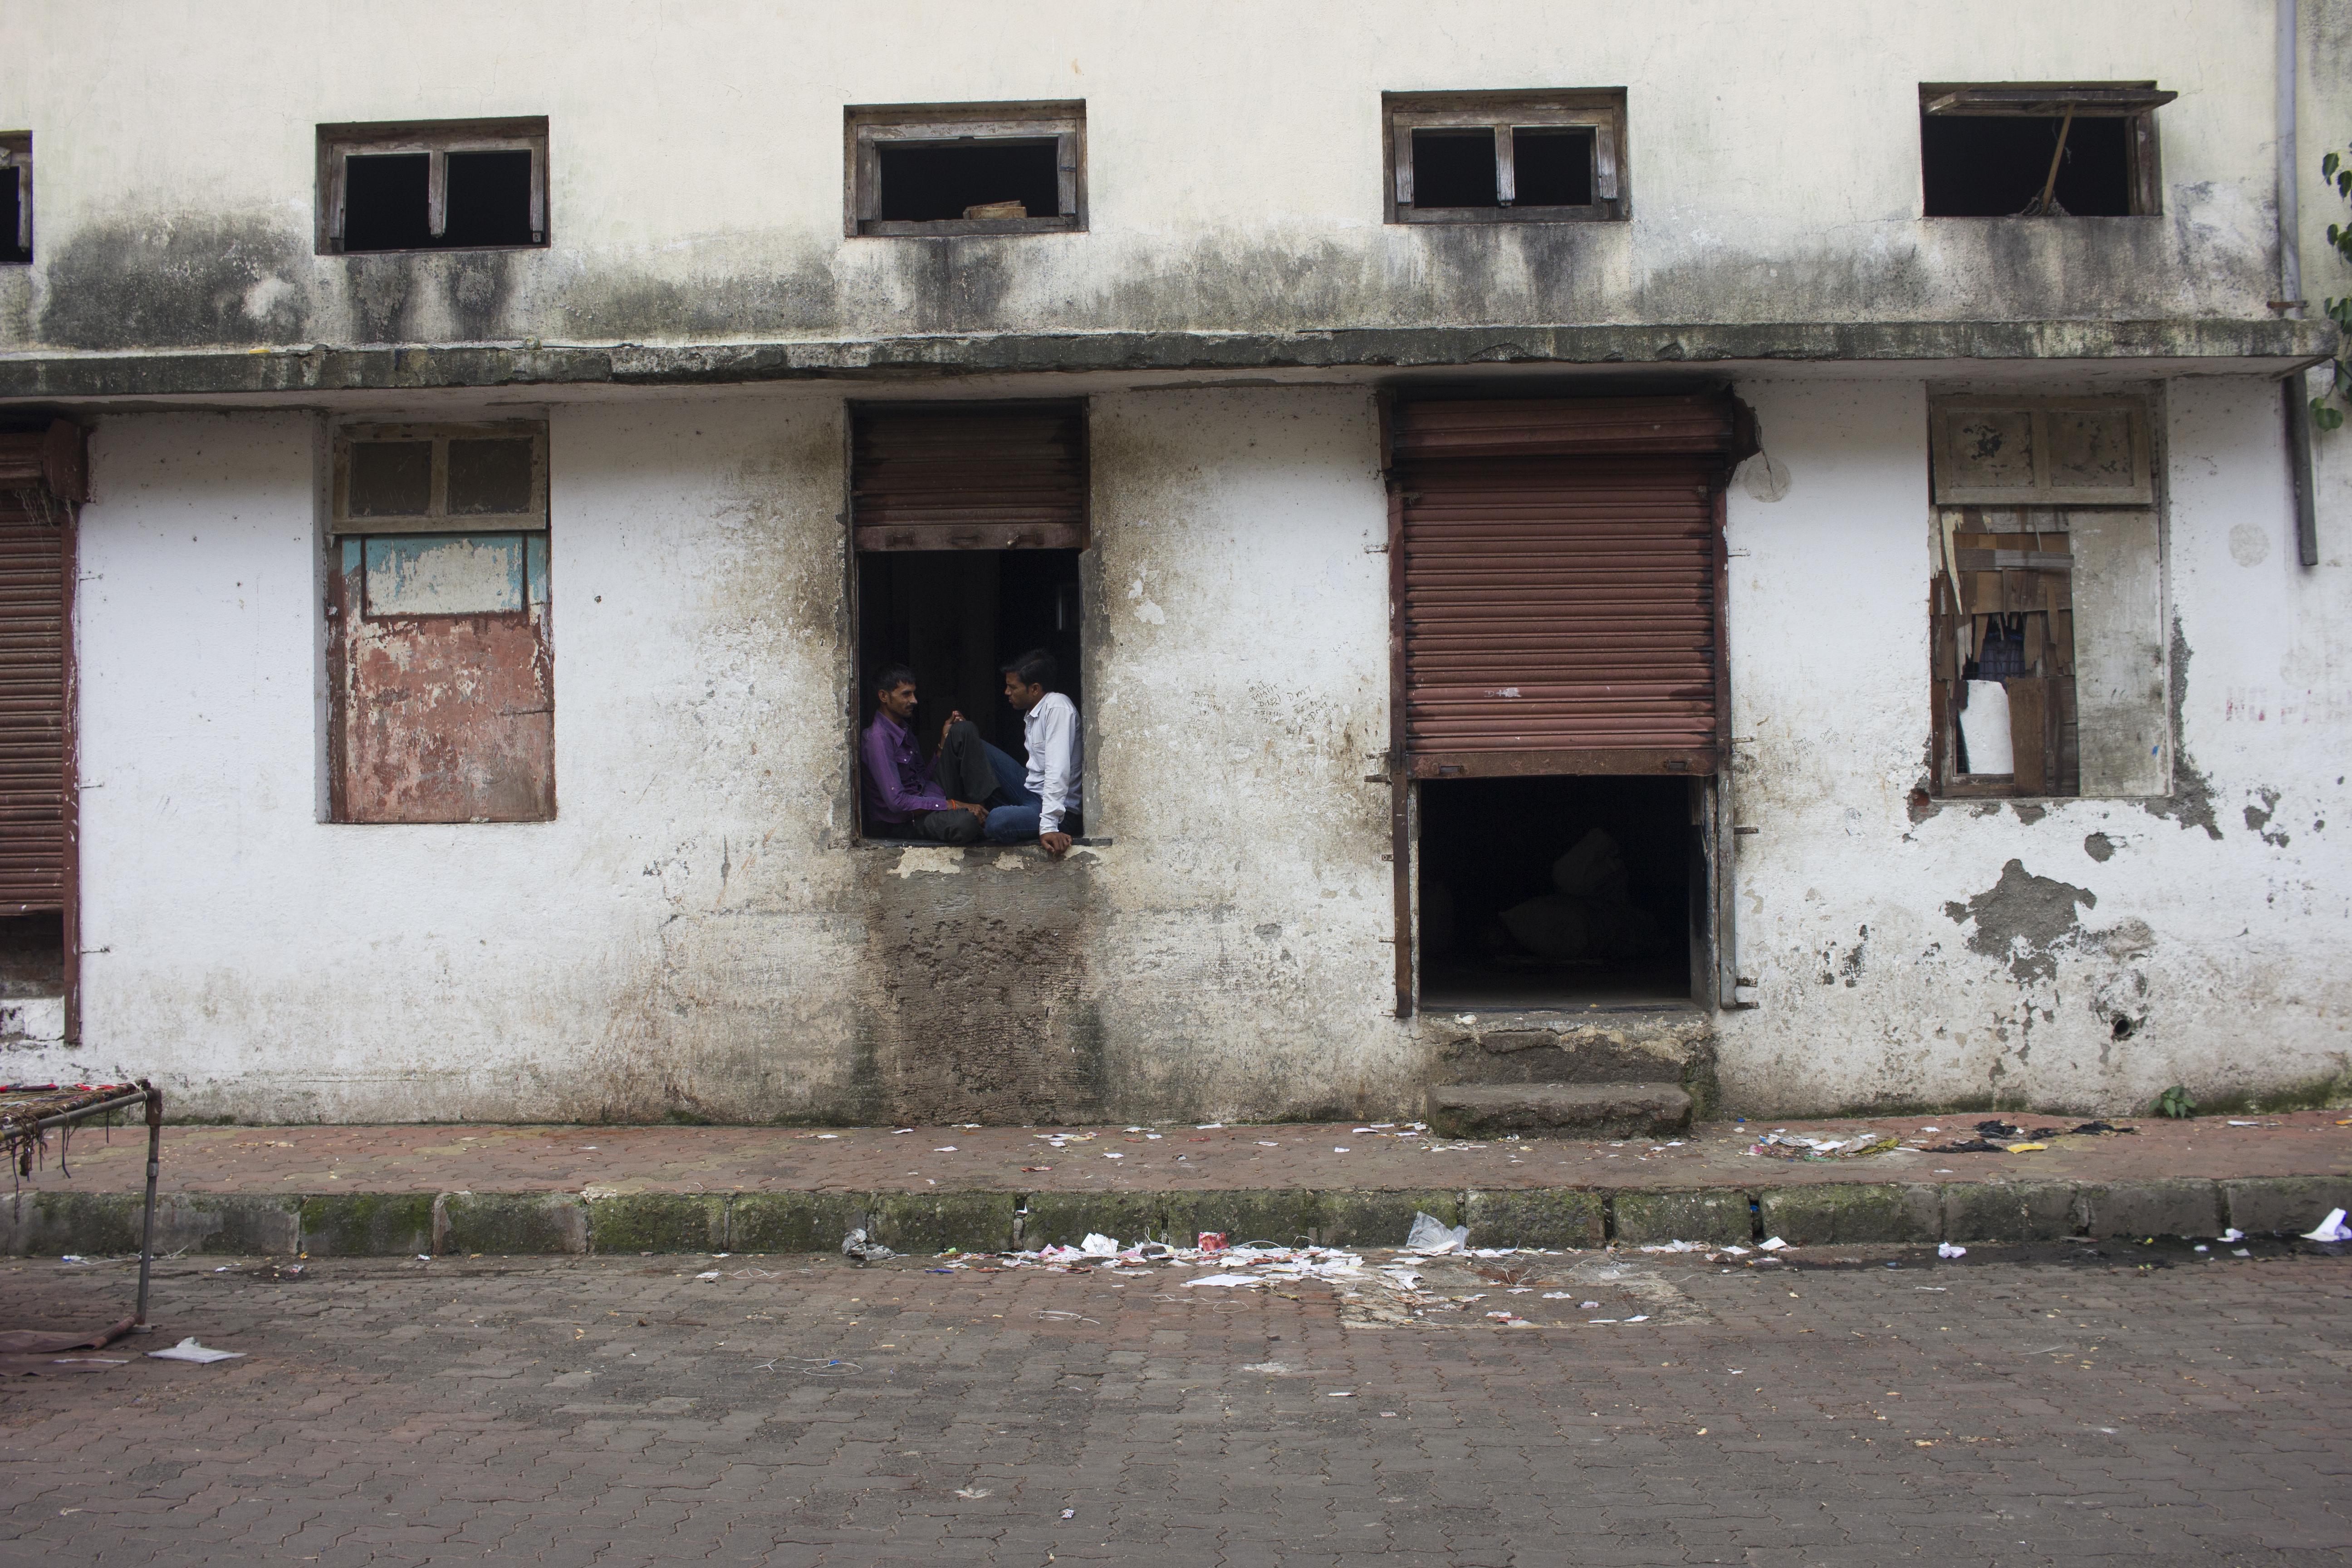 Framed Conversations, India, 2015